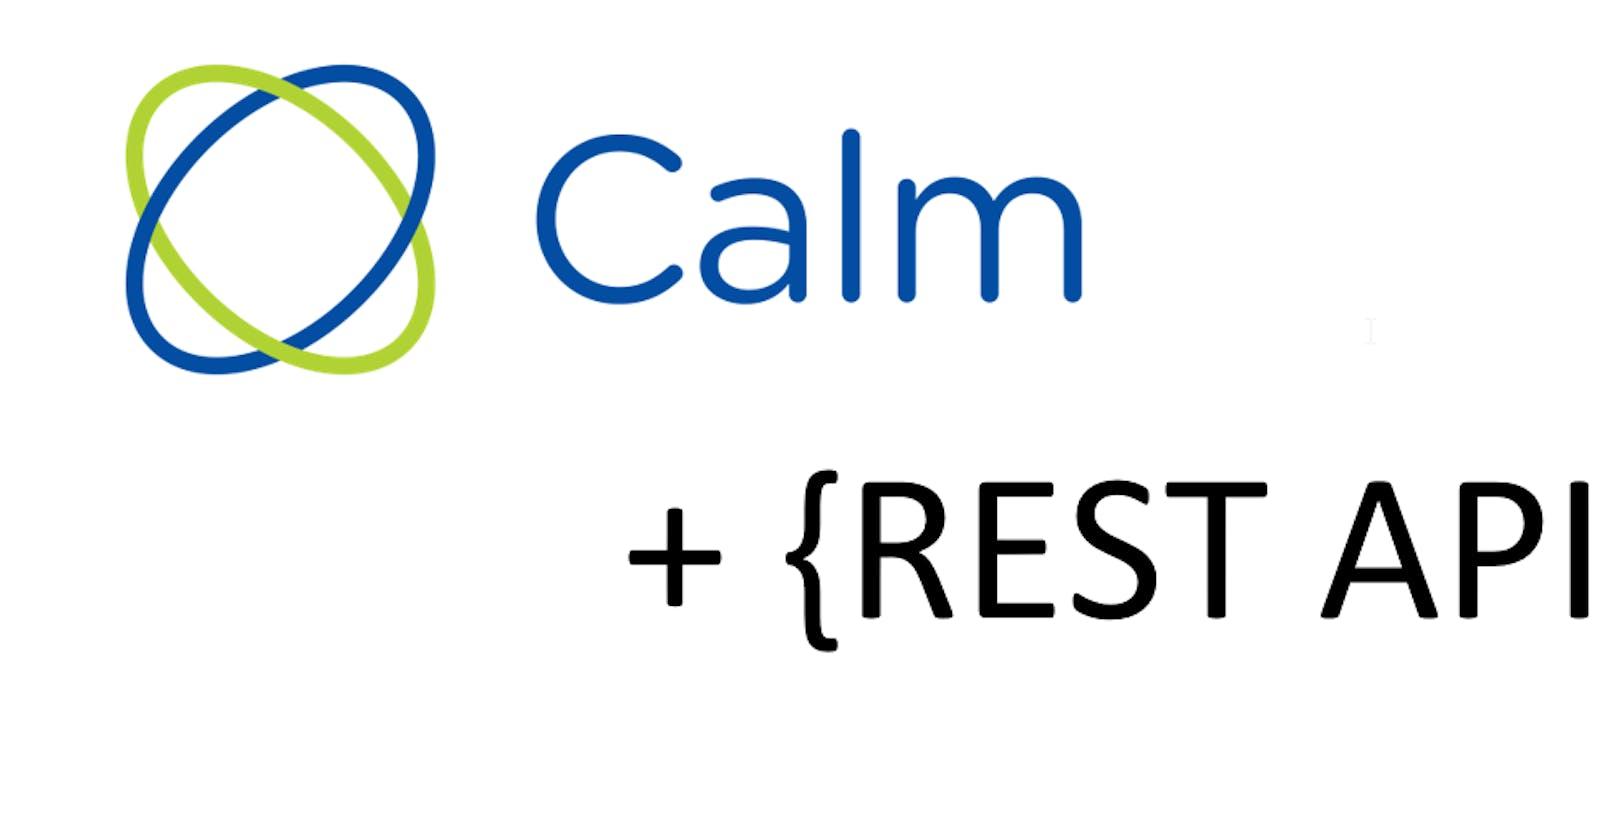 How to launch Nutanix CALM blueprint with REST API